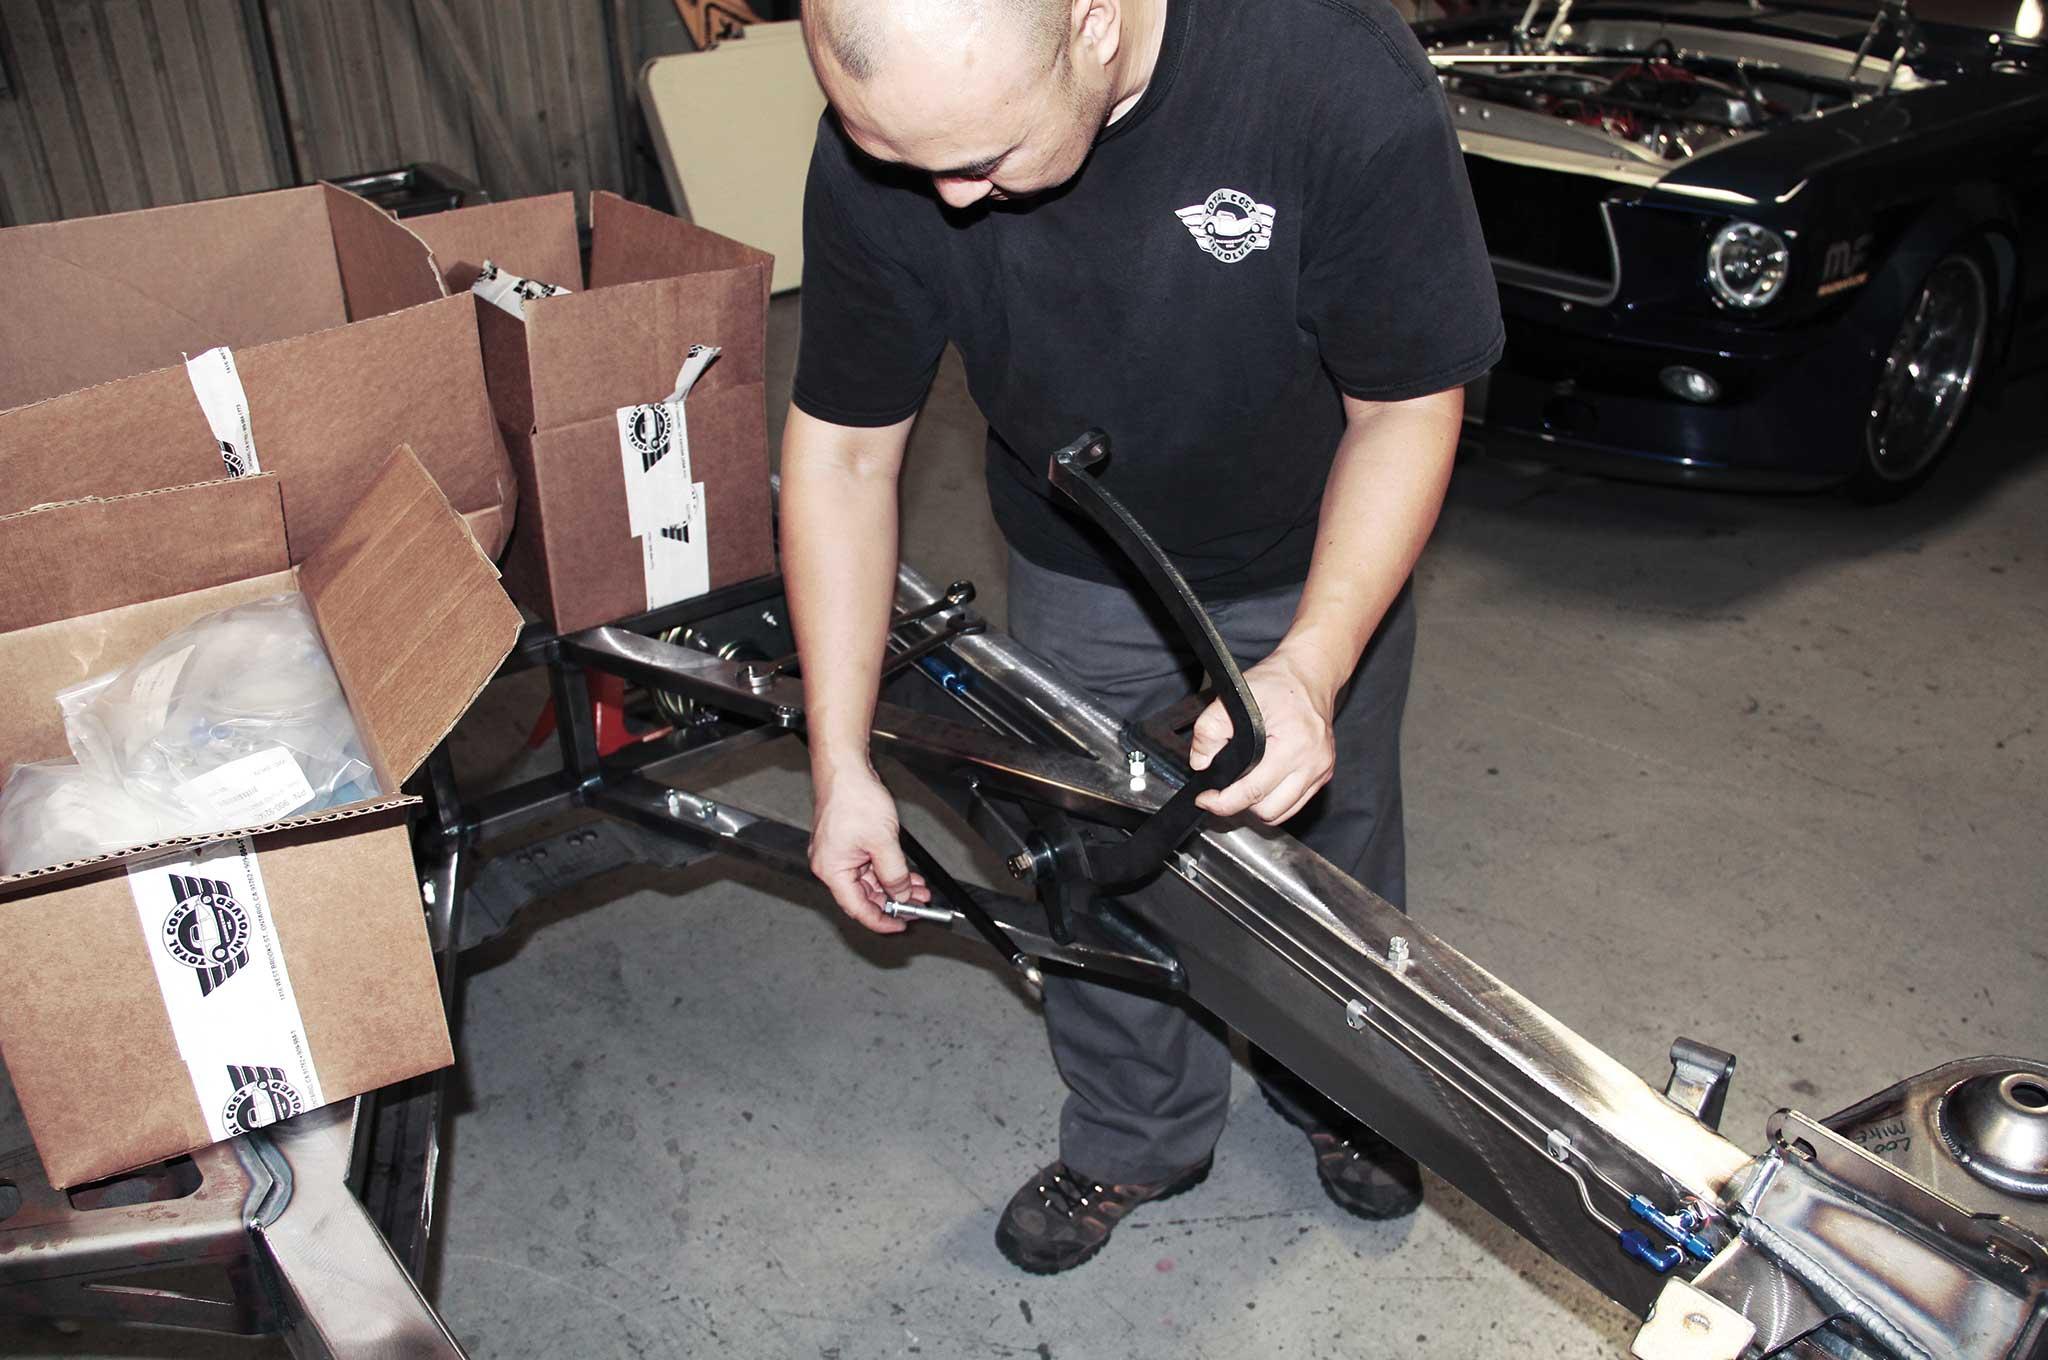 002 assembling a tci truck frame foot brake pedal bracket install